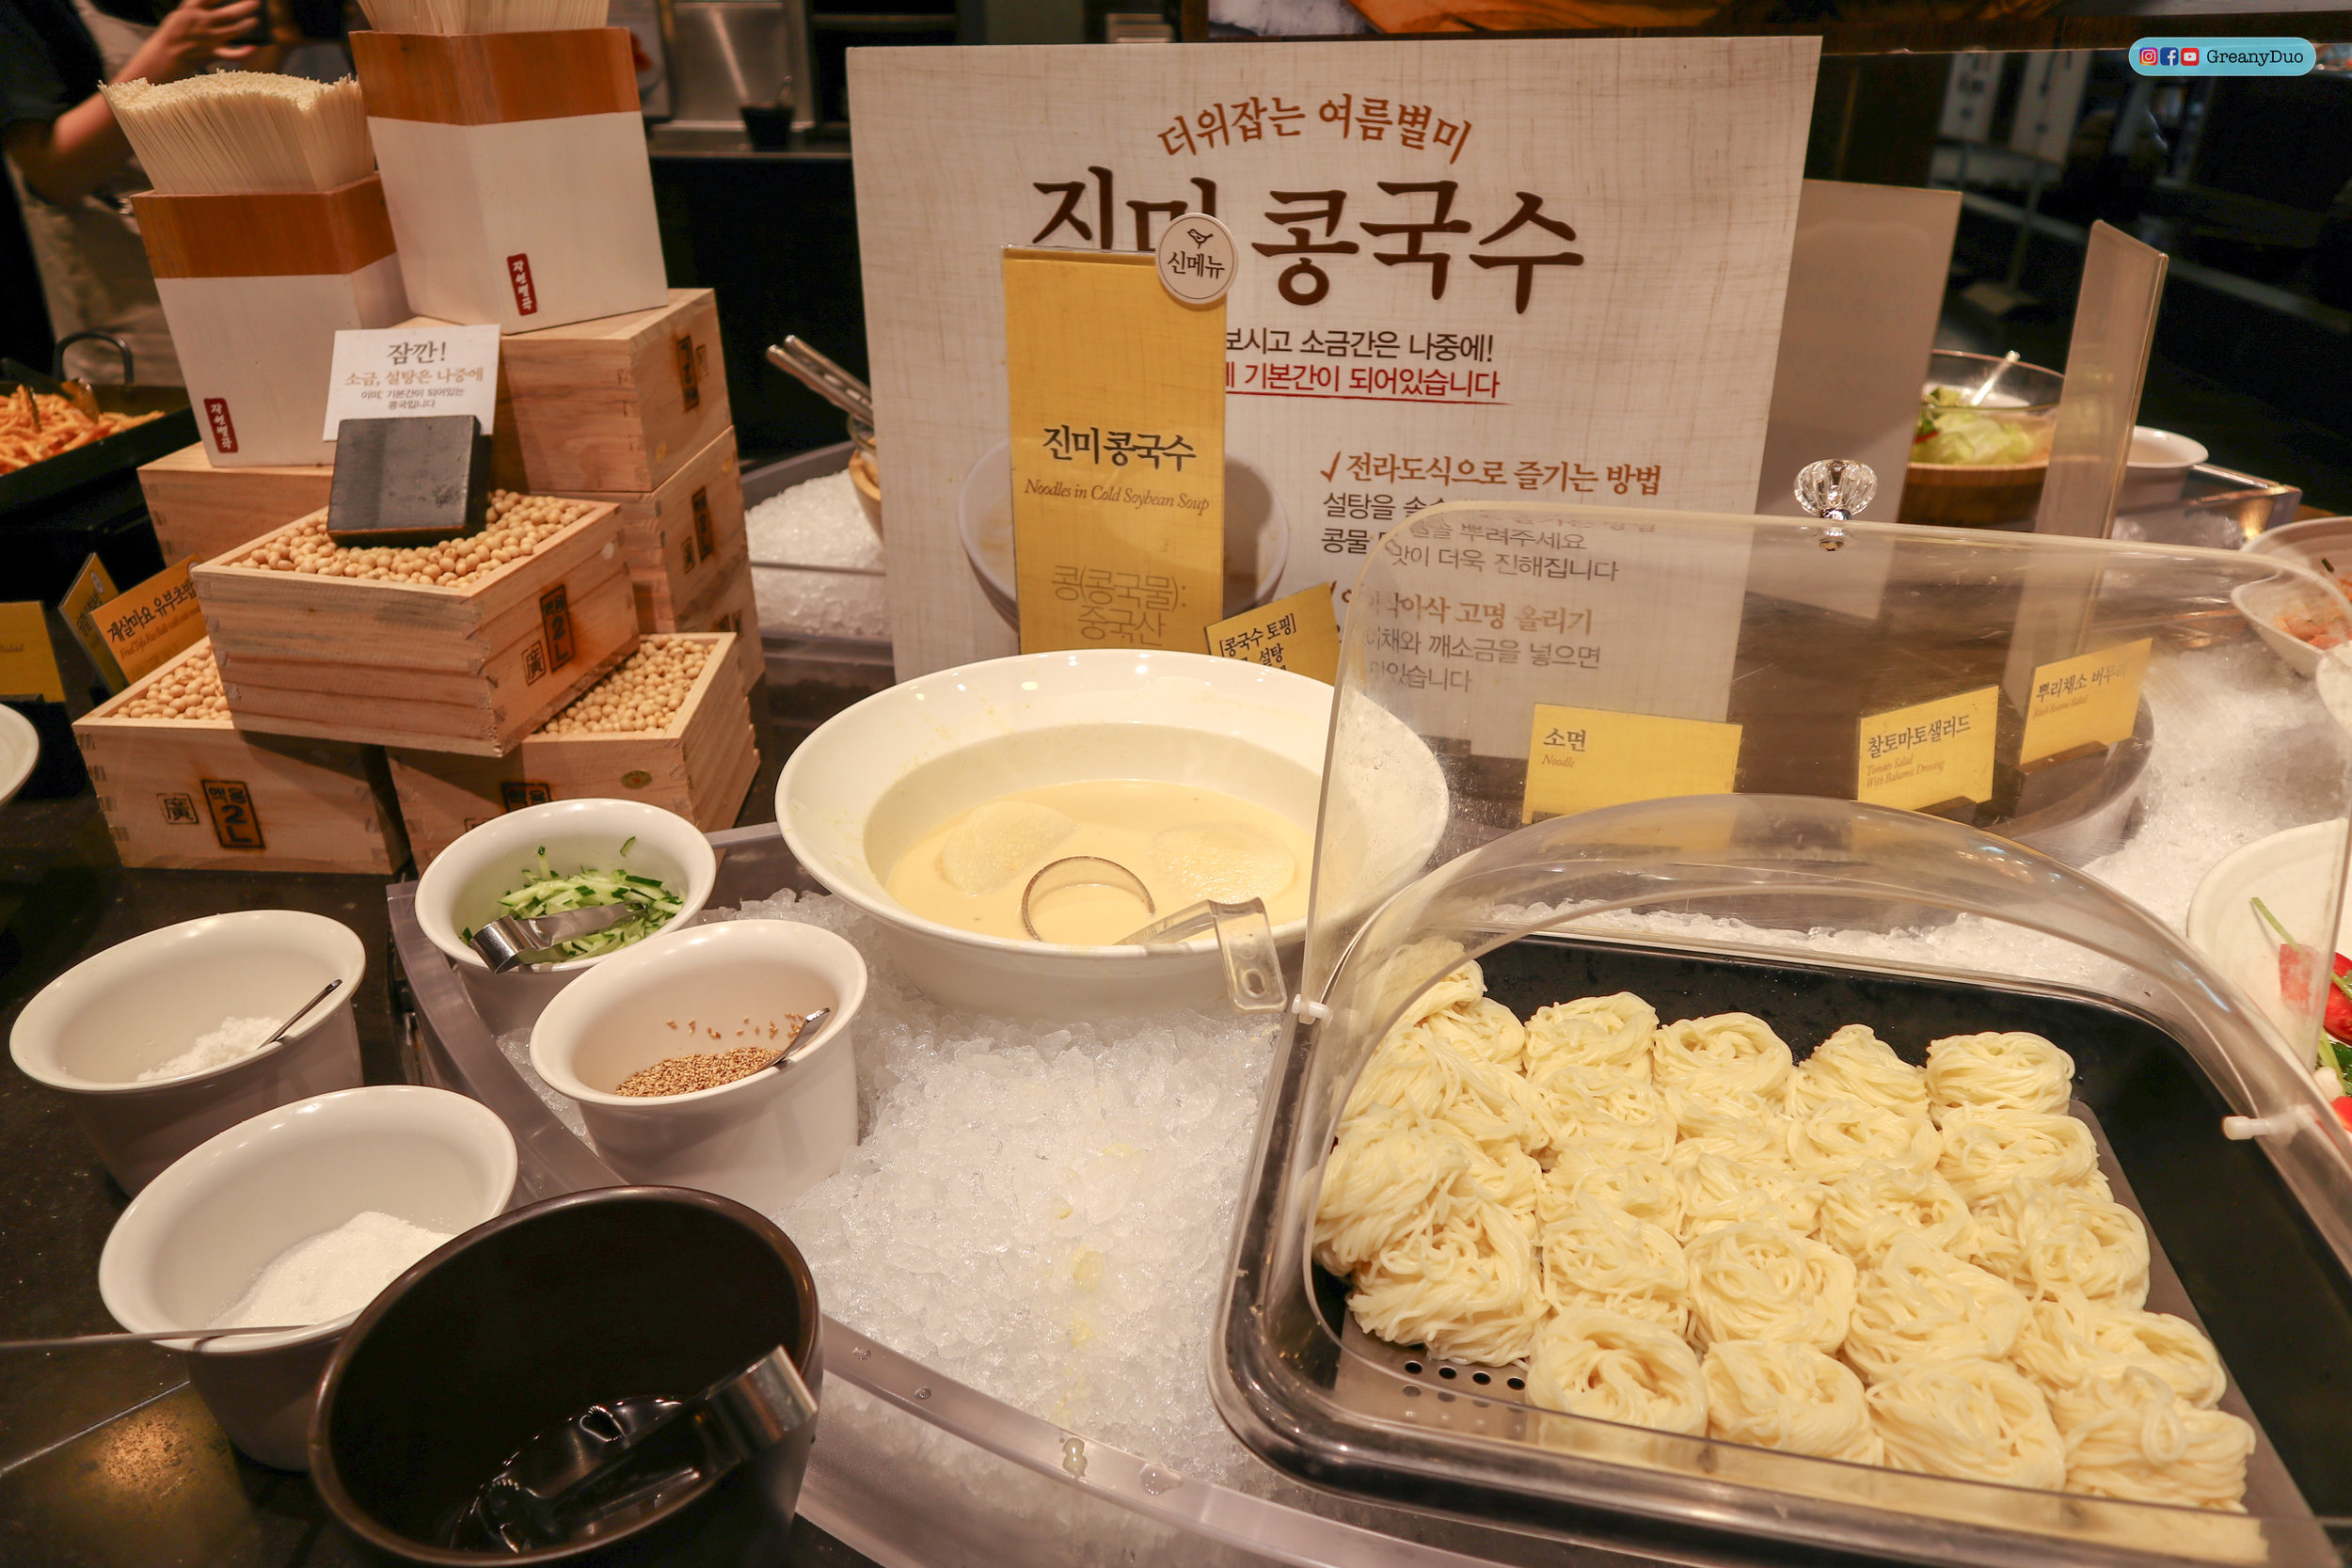 cold korean noodle, nature kitchen buffet, seoul korea